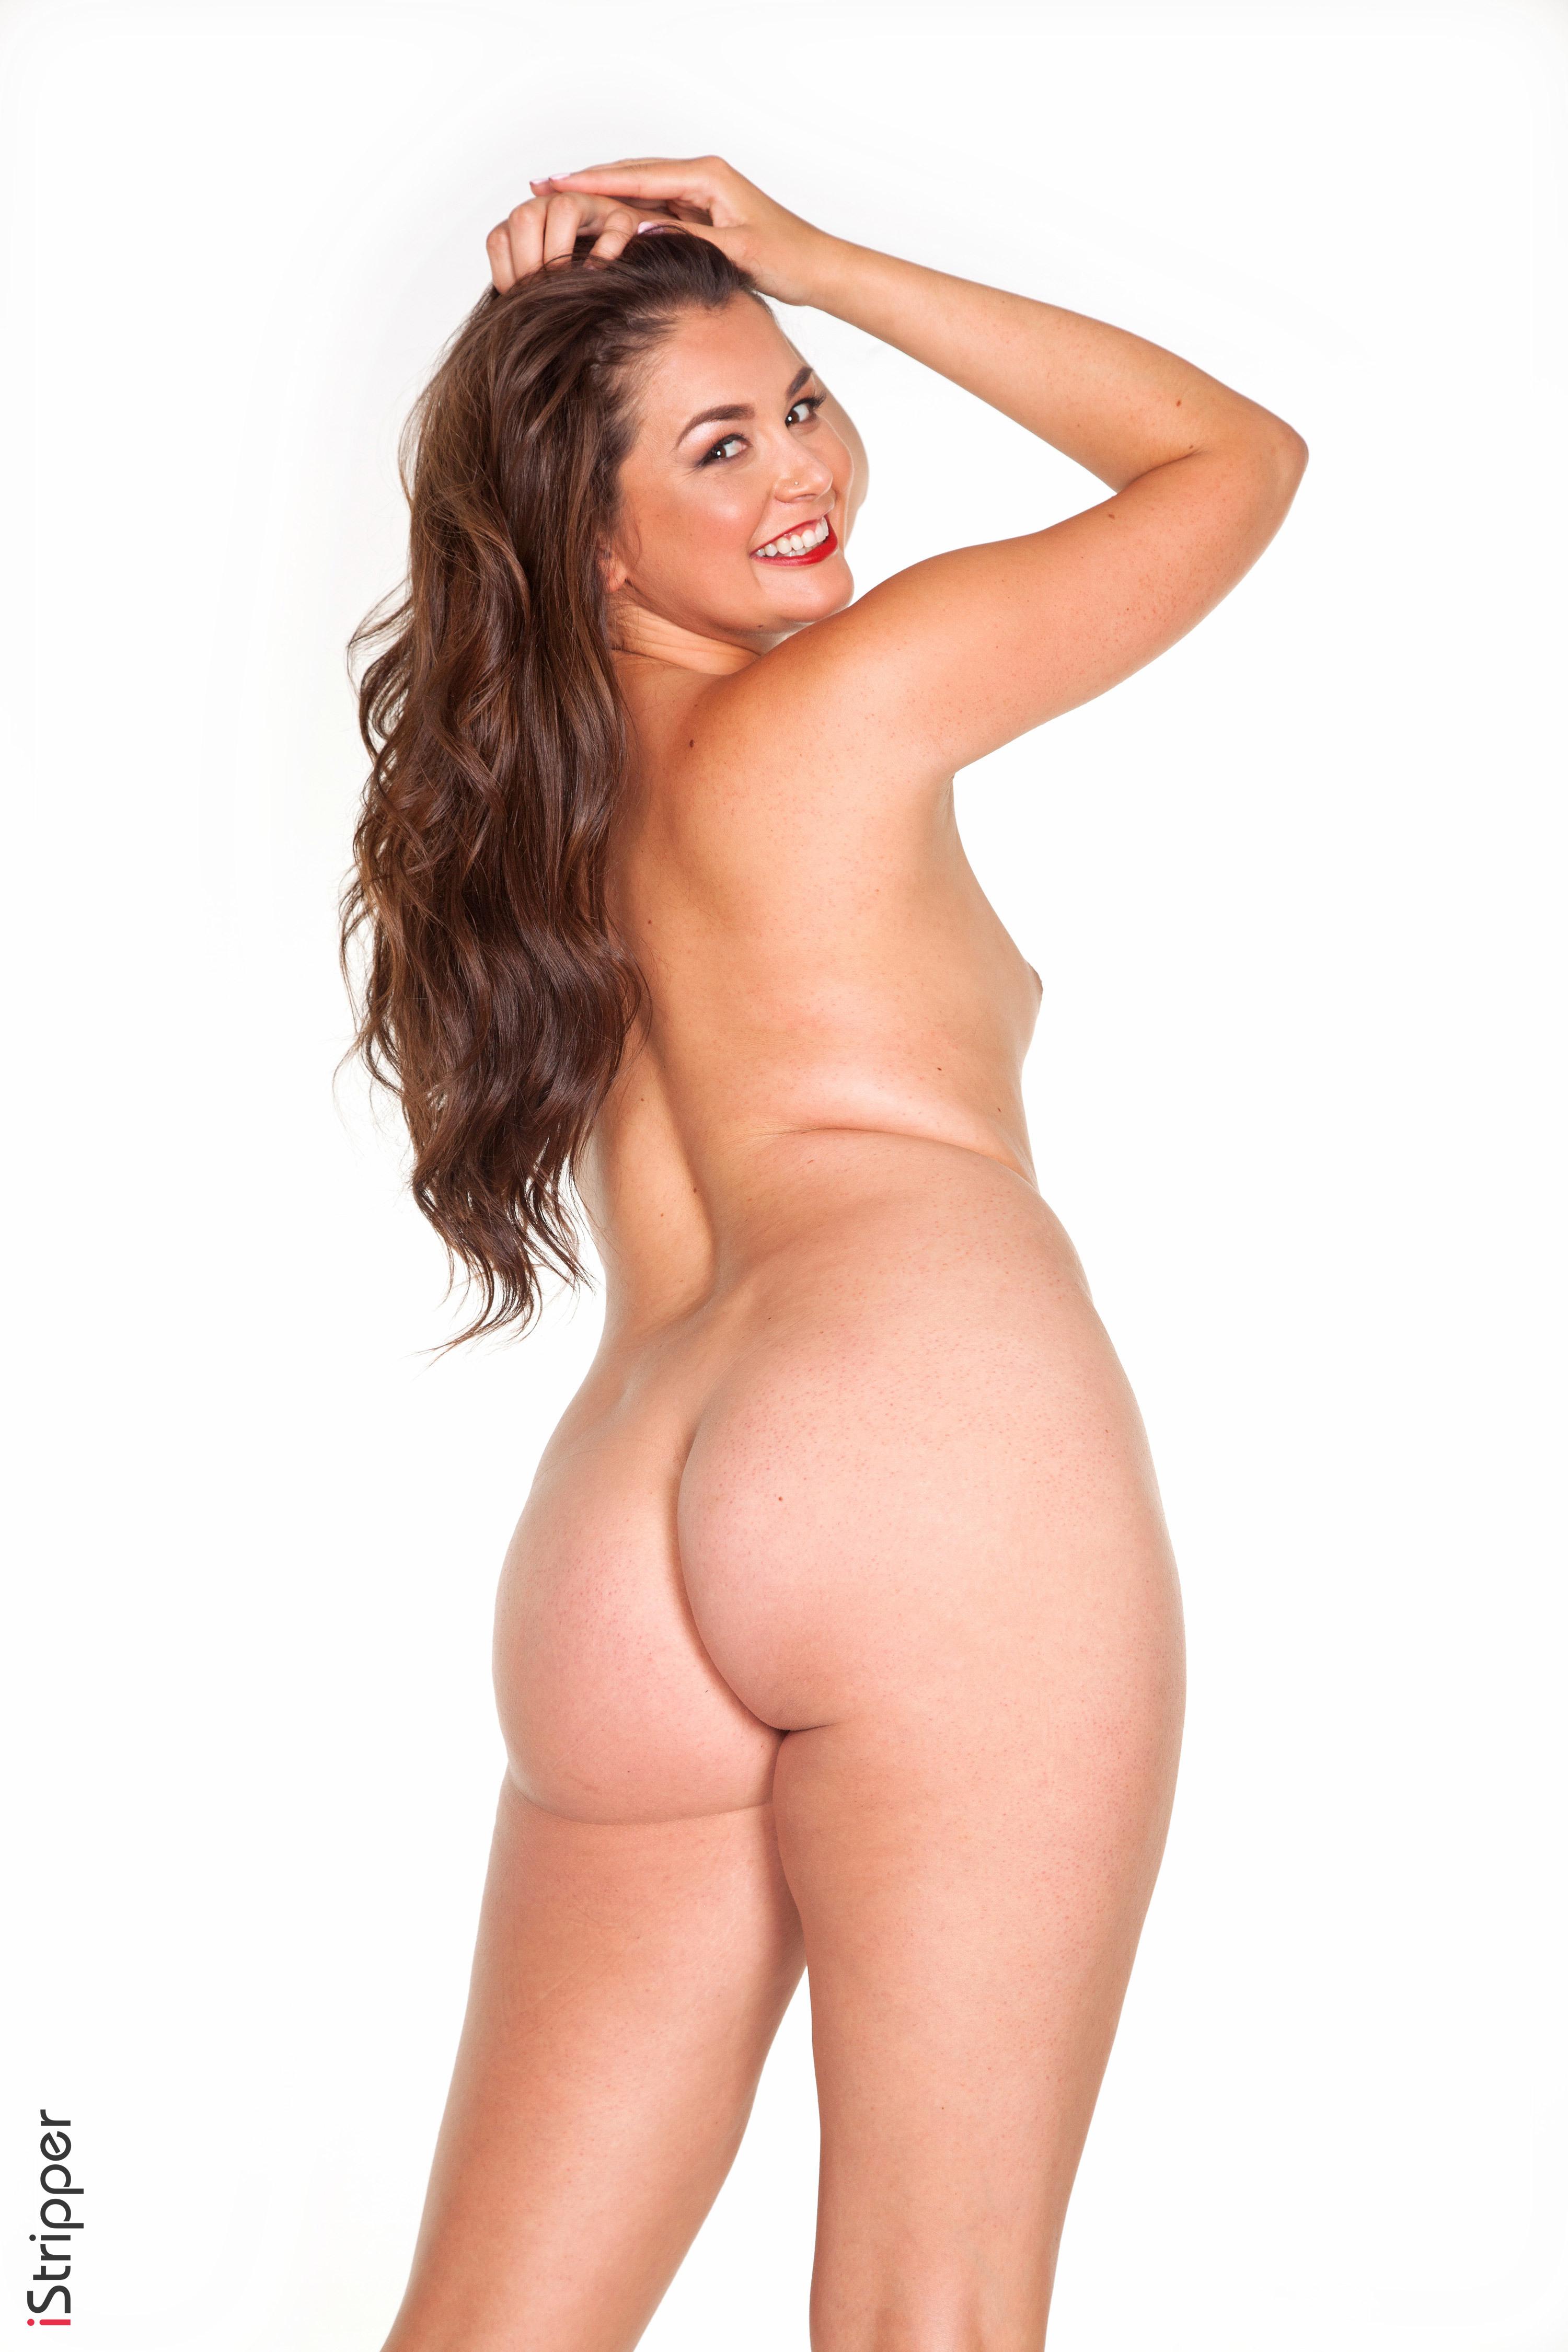 big breasted girls stripping